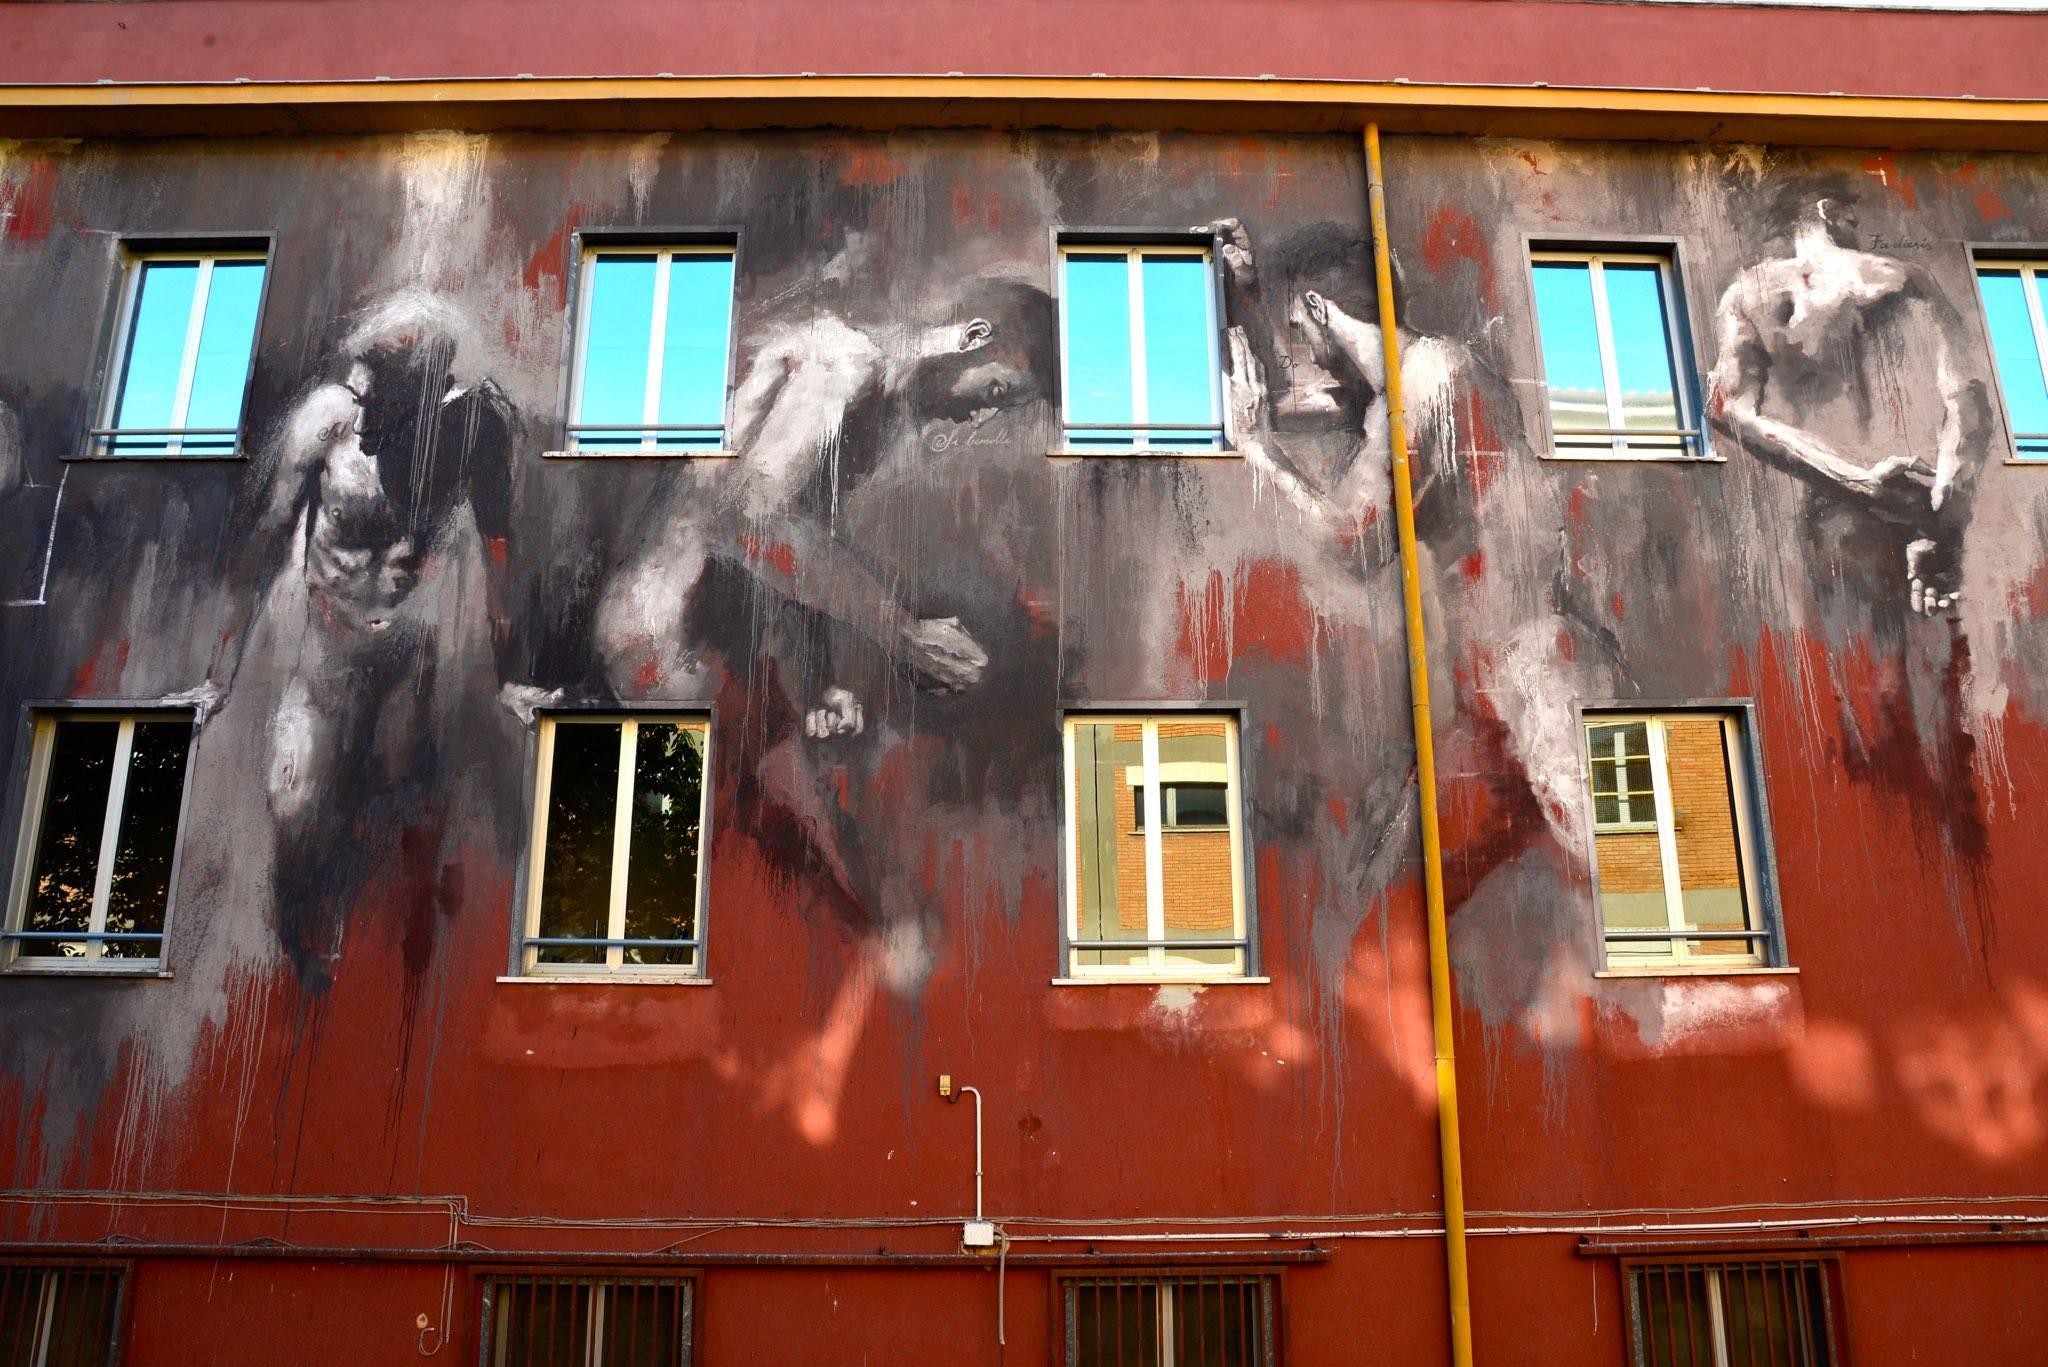 Luis gomez de teran mural street art artpeople net for Mural street art